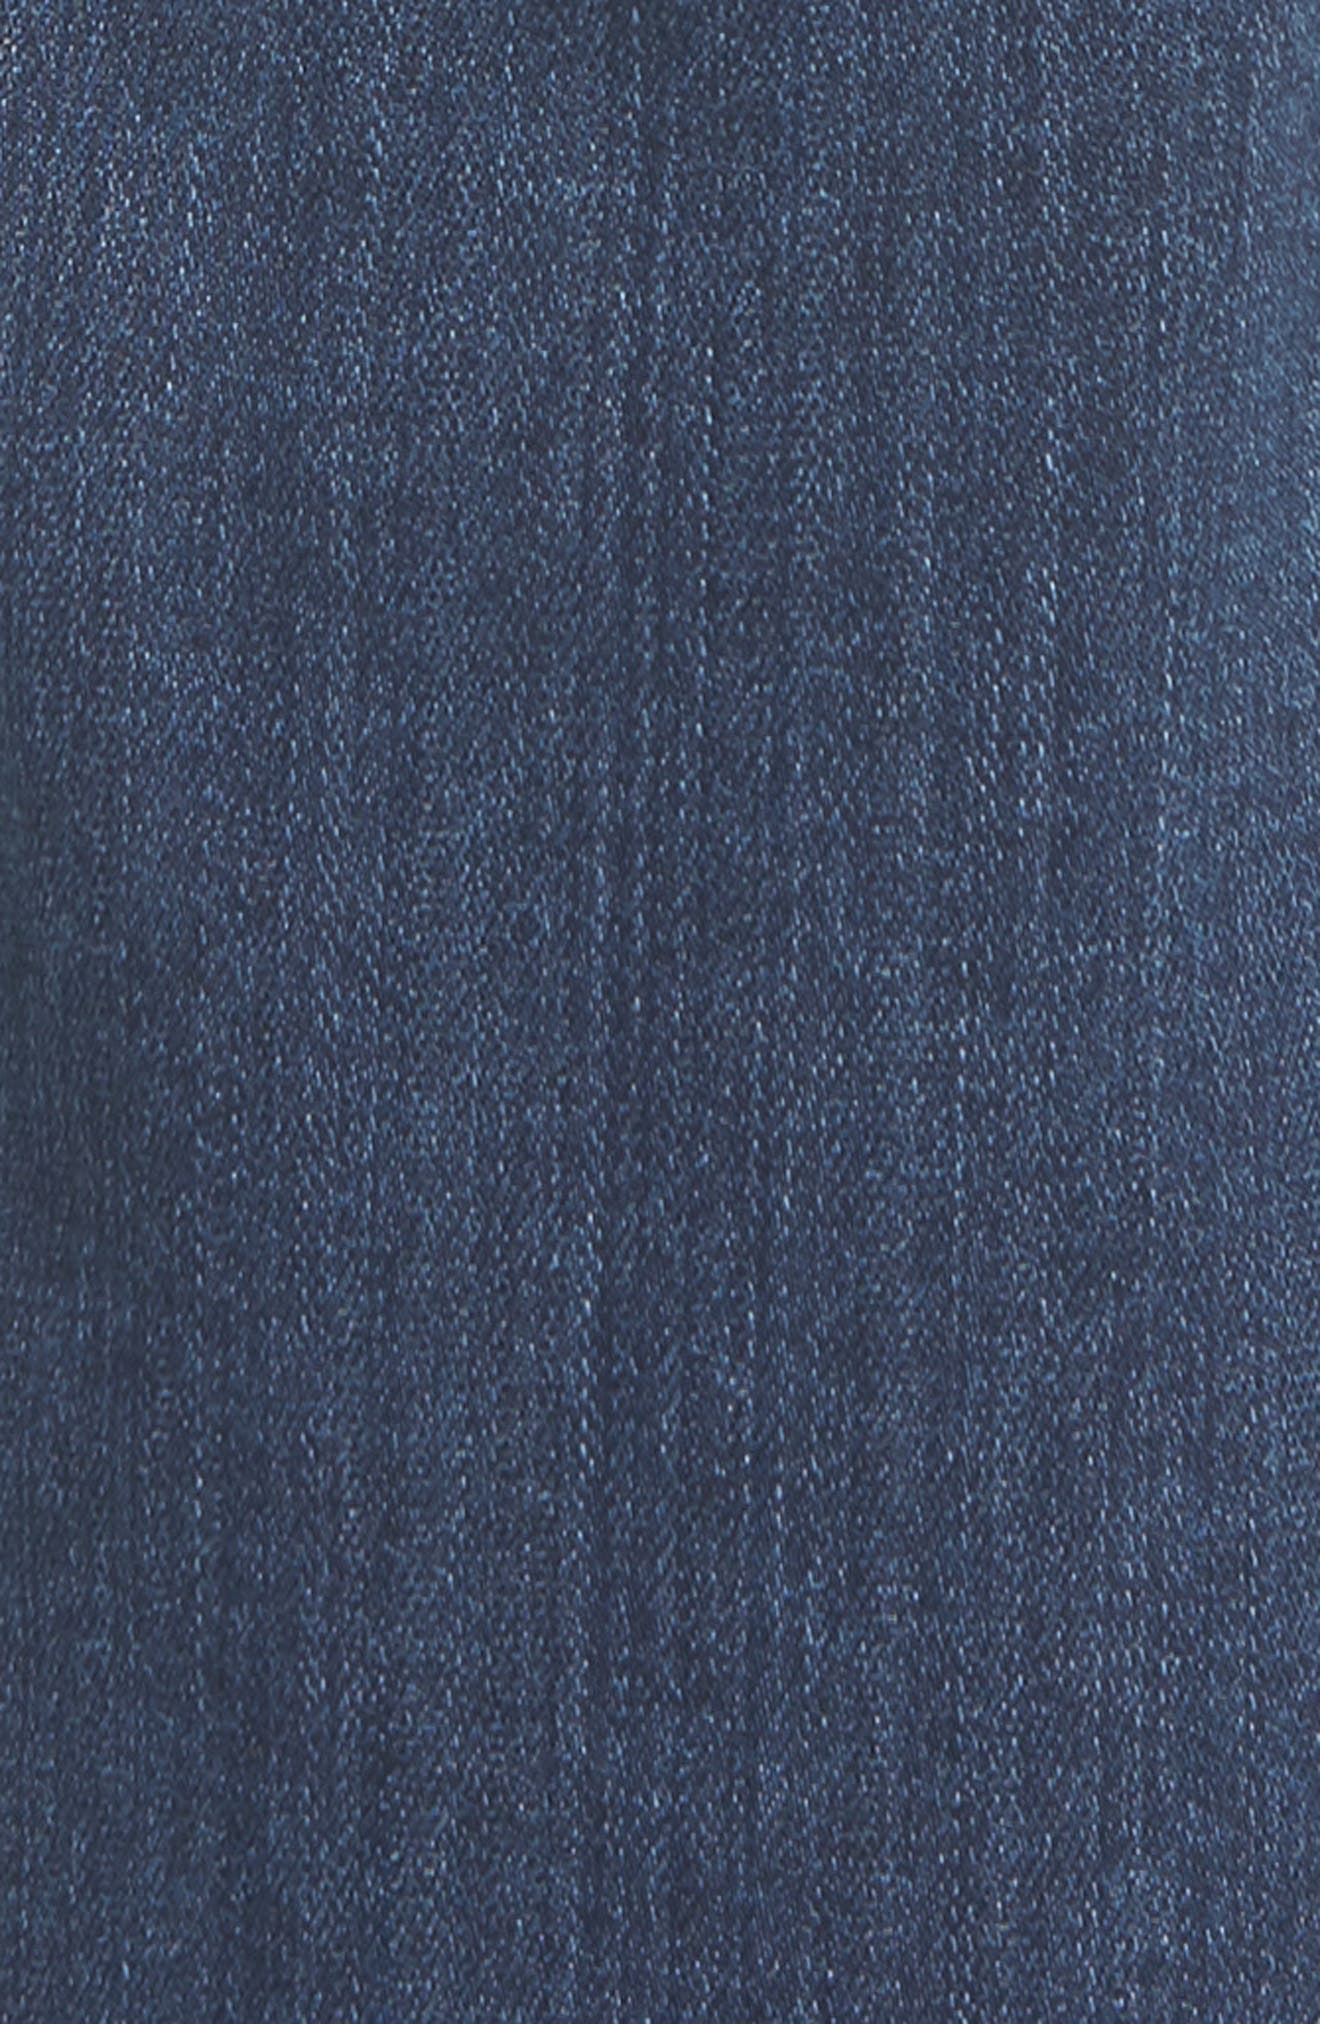 Normandie Straight Leg Jeans,                             Alternate thumbnail 5, color,                             Lowe